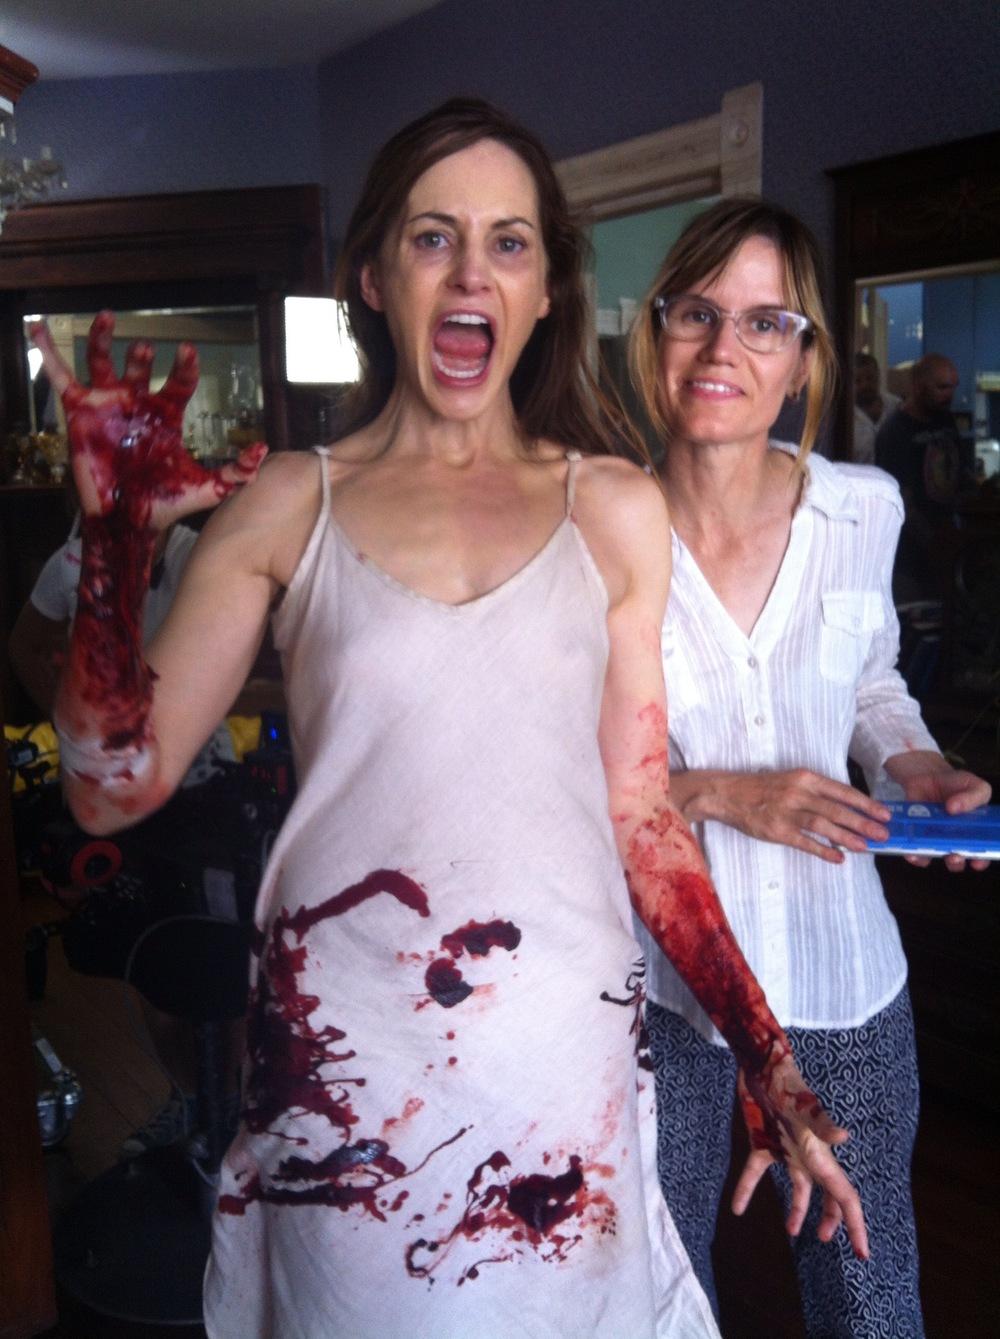 Bloody 2.JPG